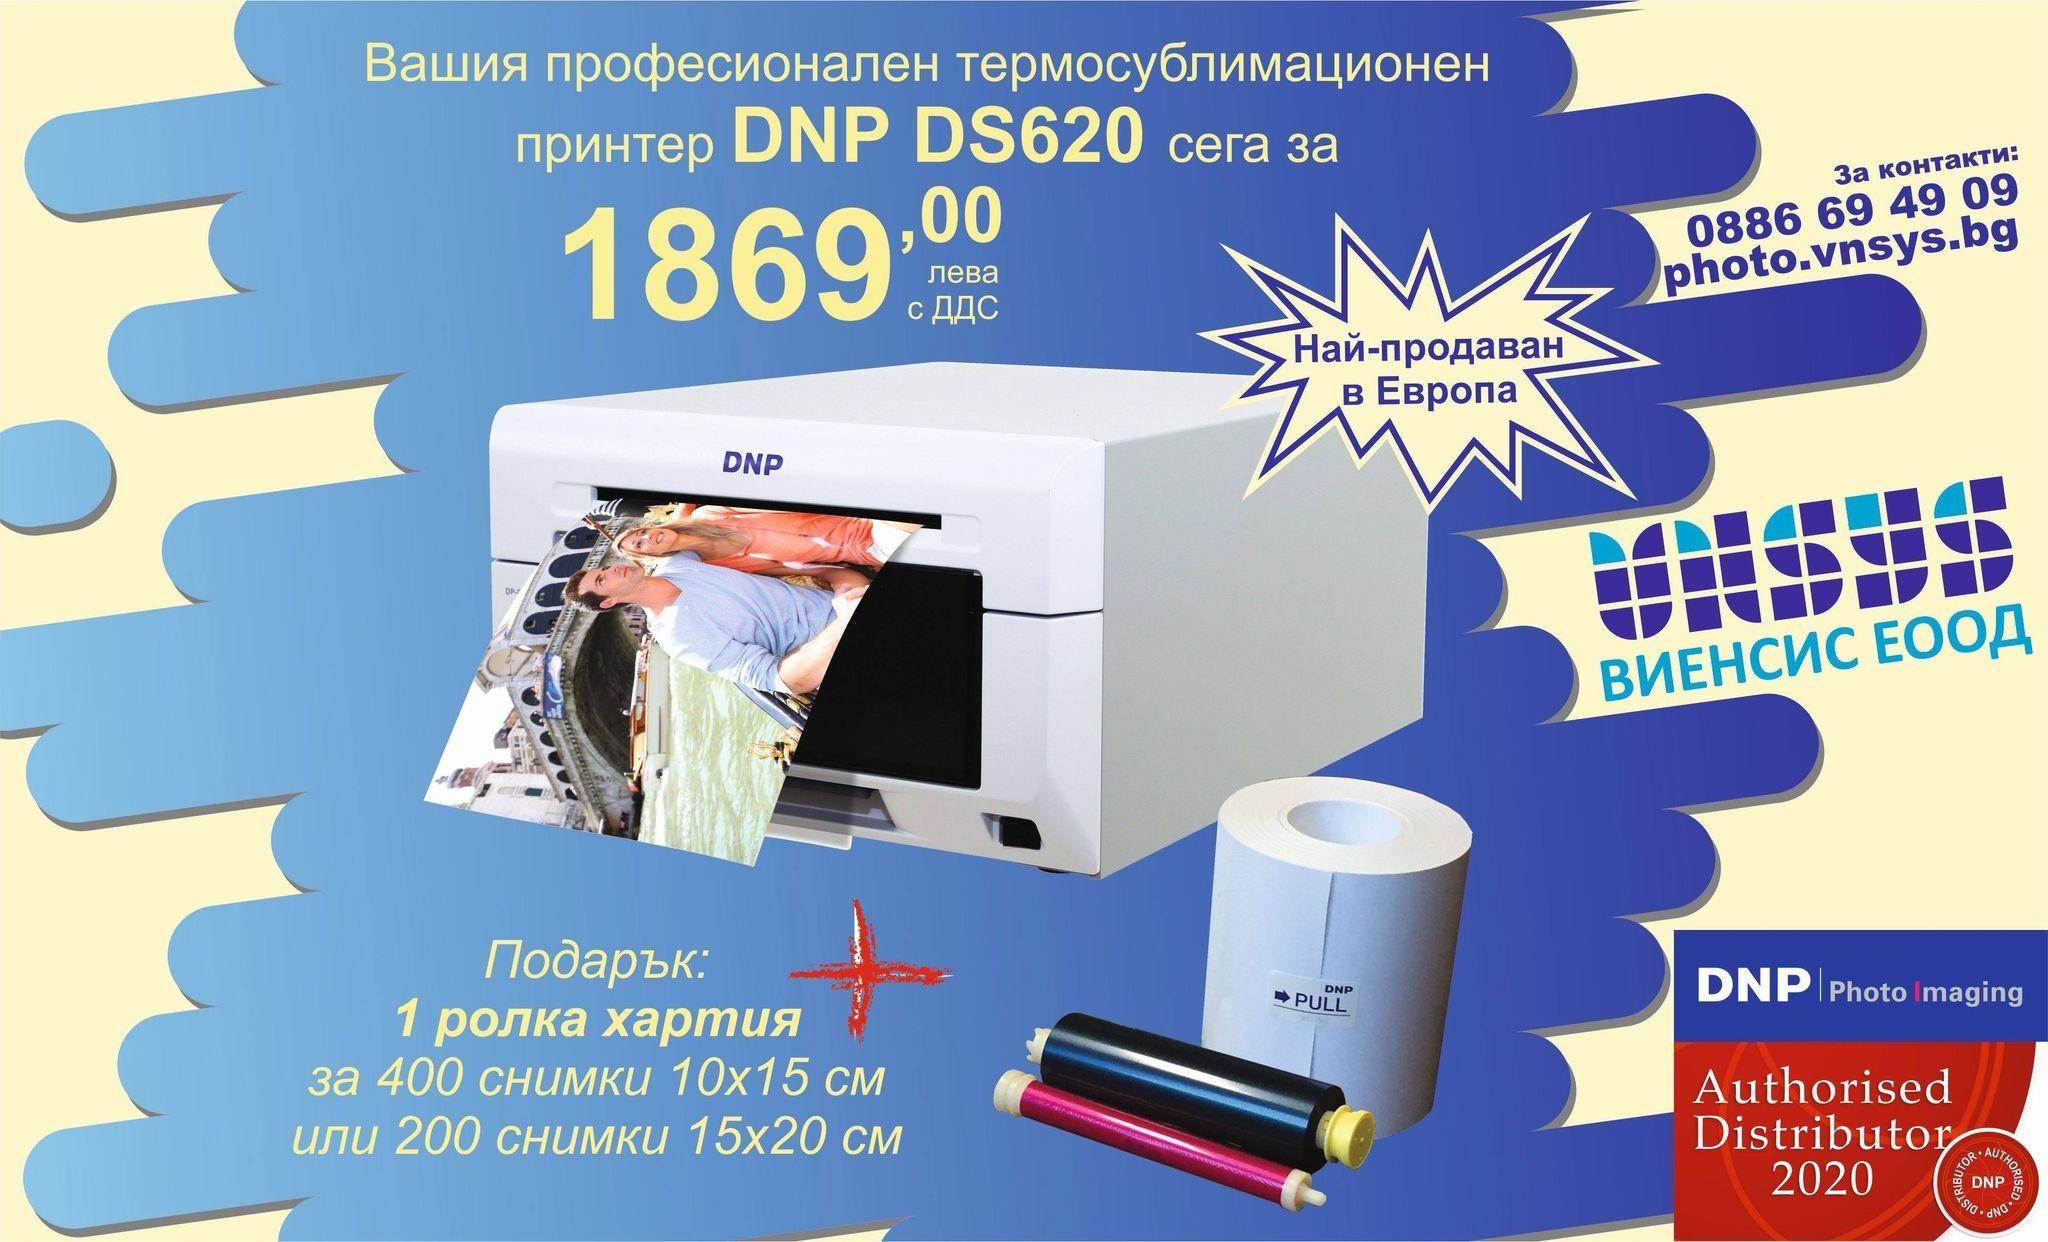 DNP DS620